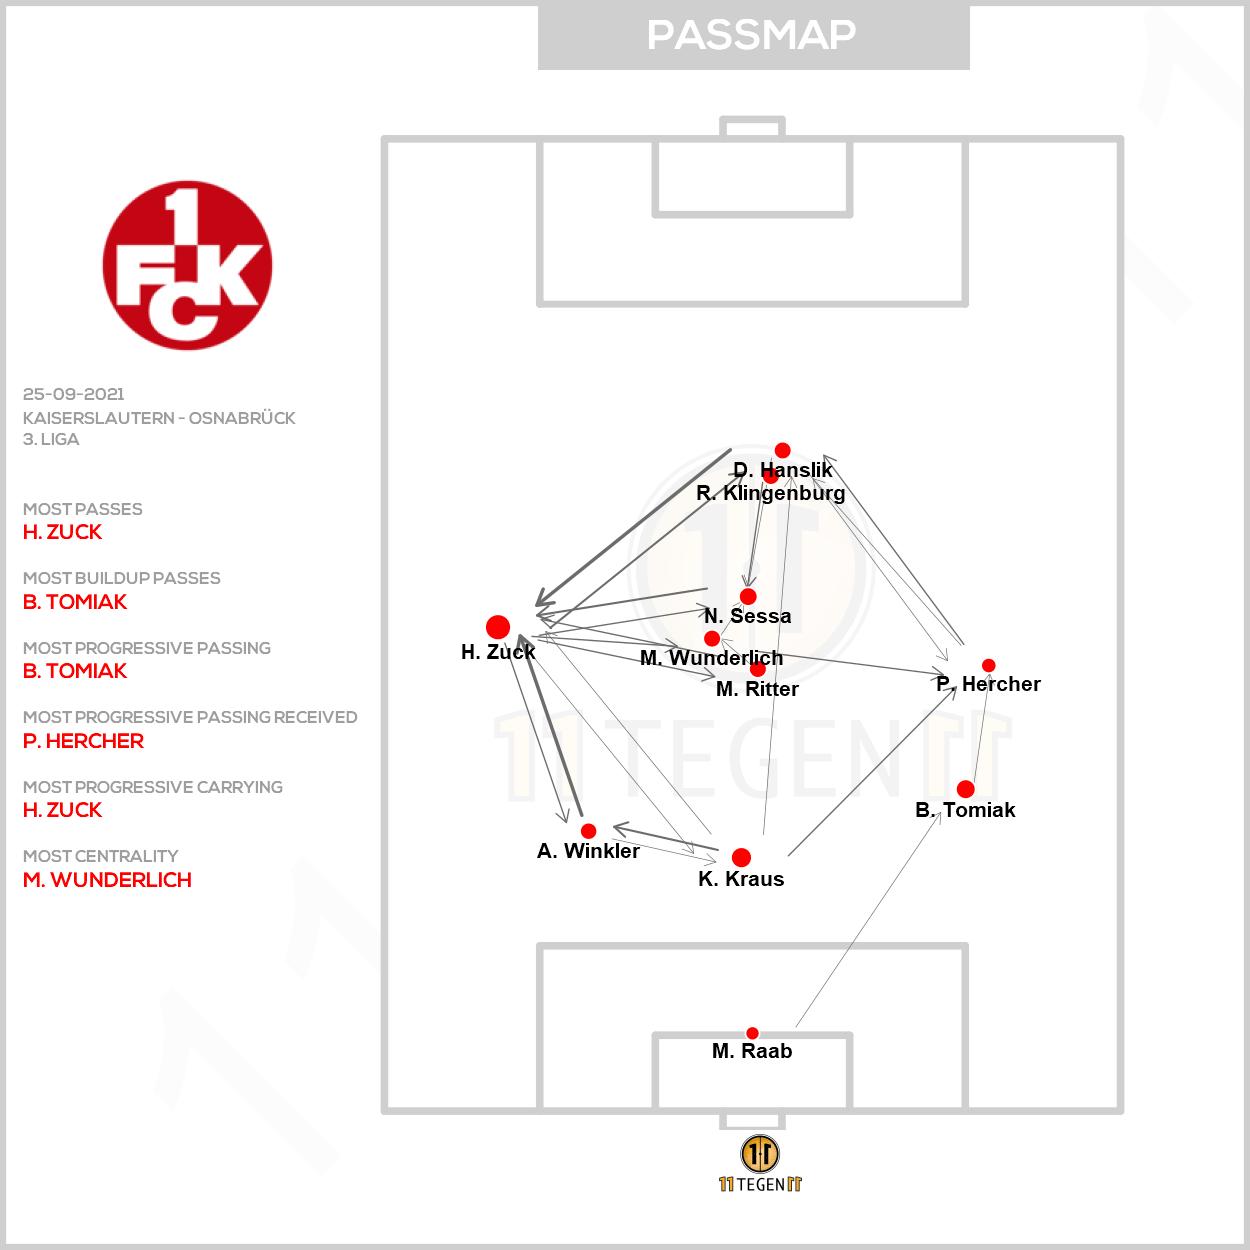 Passmap FCK